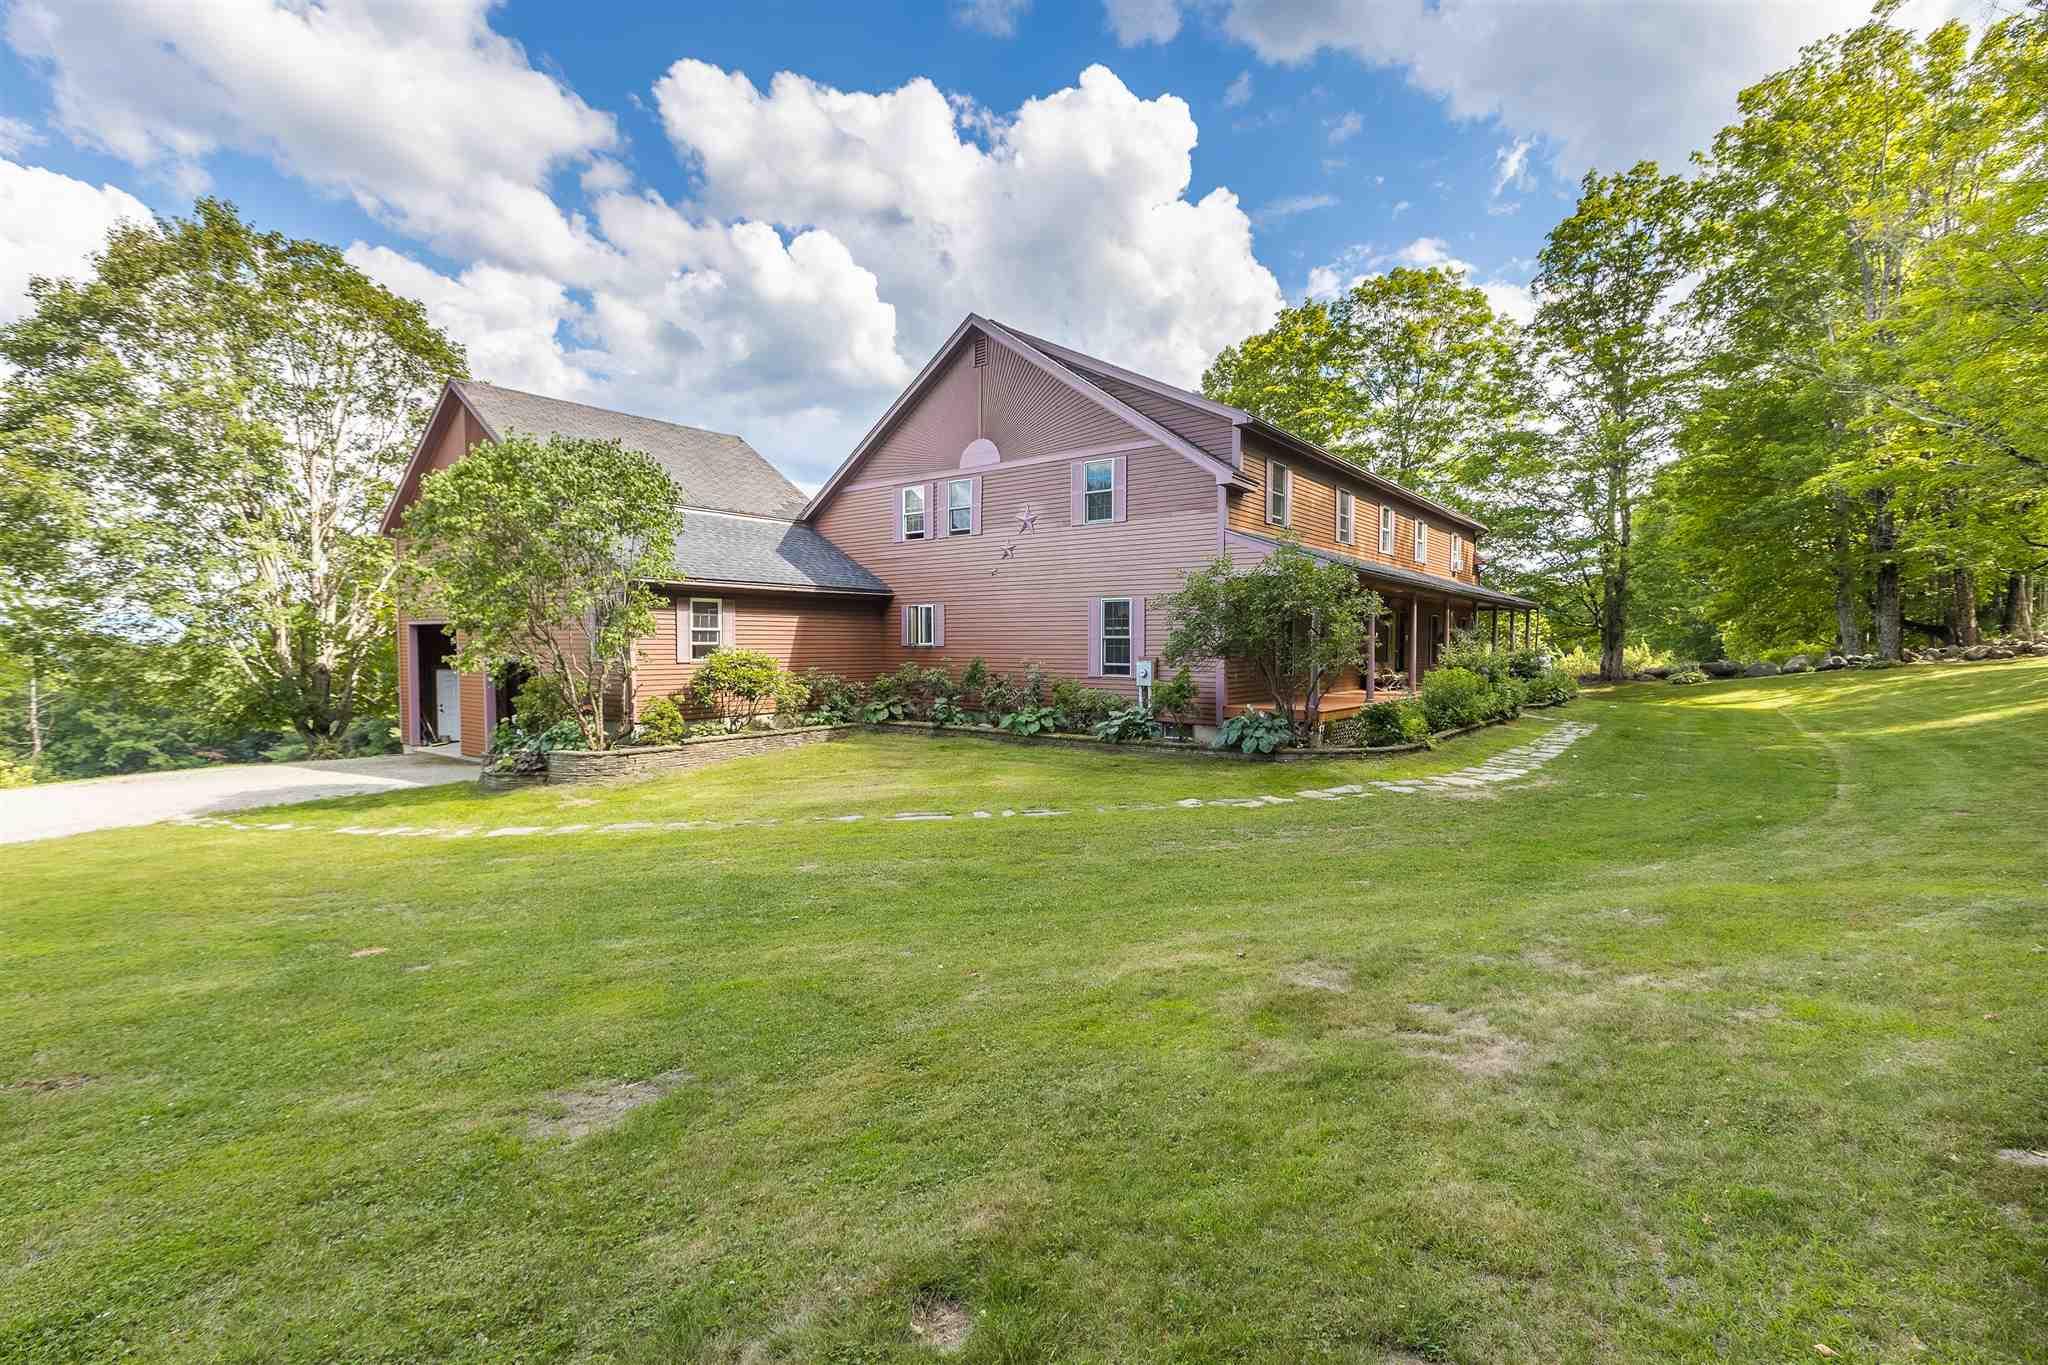 Weathersfield, VT Real Estate